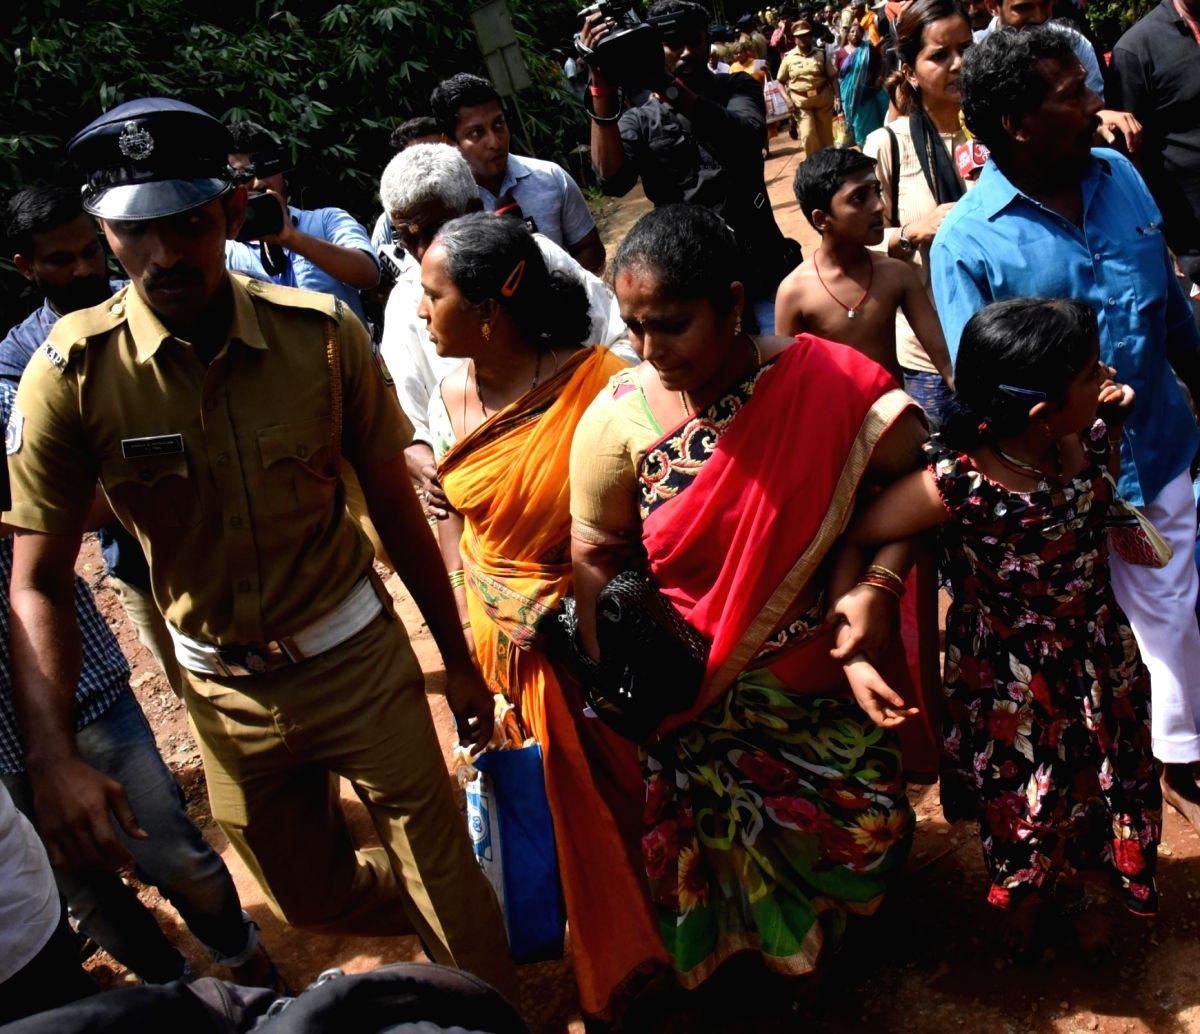 Women devotees attempt to enter Sabarimala temple on Oct 17, 2018